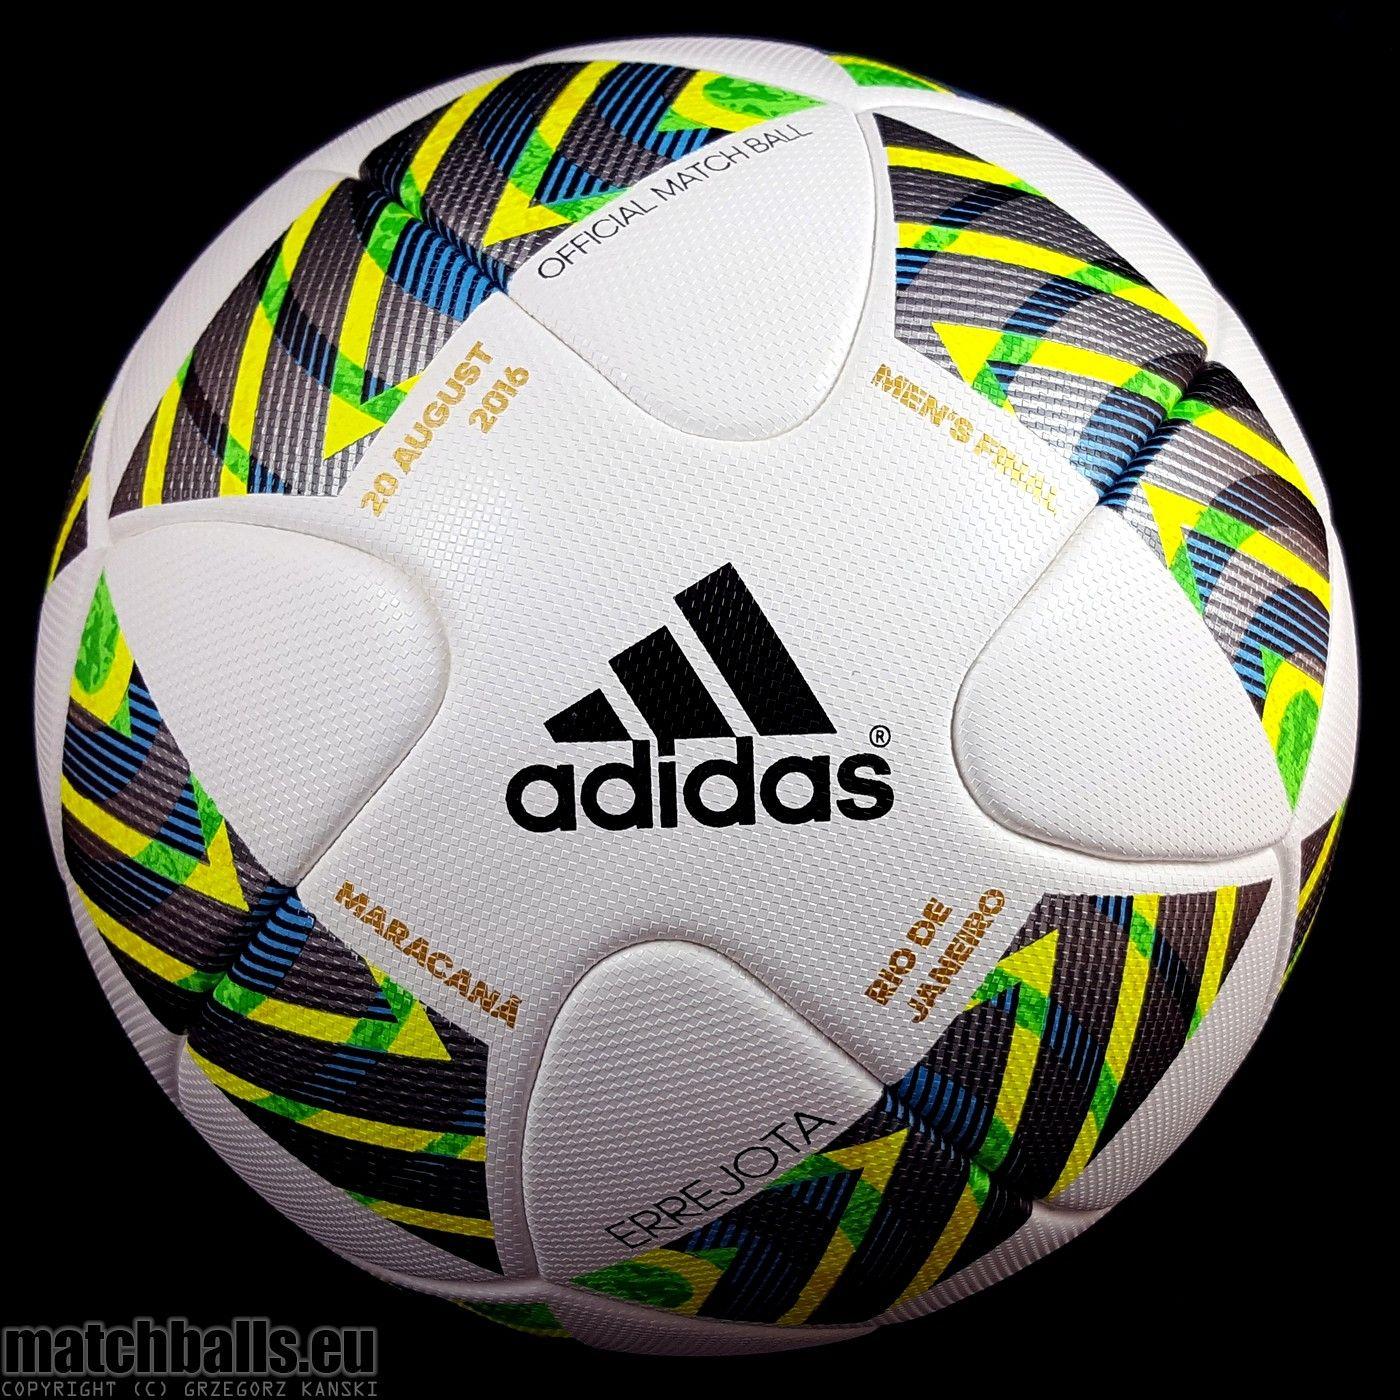 meet 0aba7 bb698 ... france olympic final match ball rio de janeiro 2016 adidas errejota  64164 f50a9